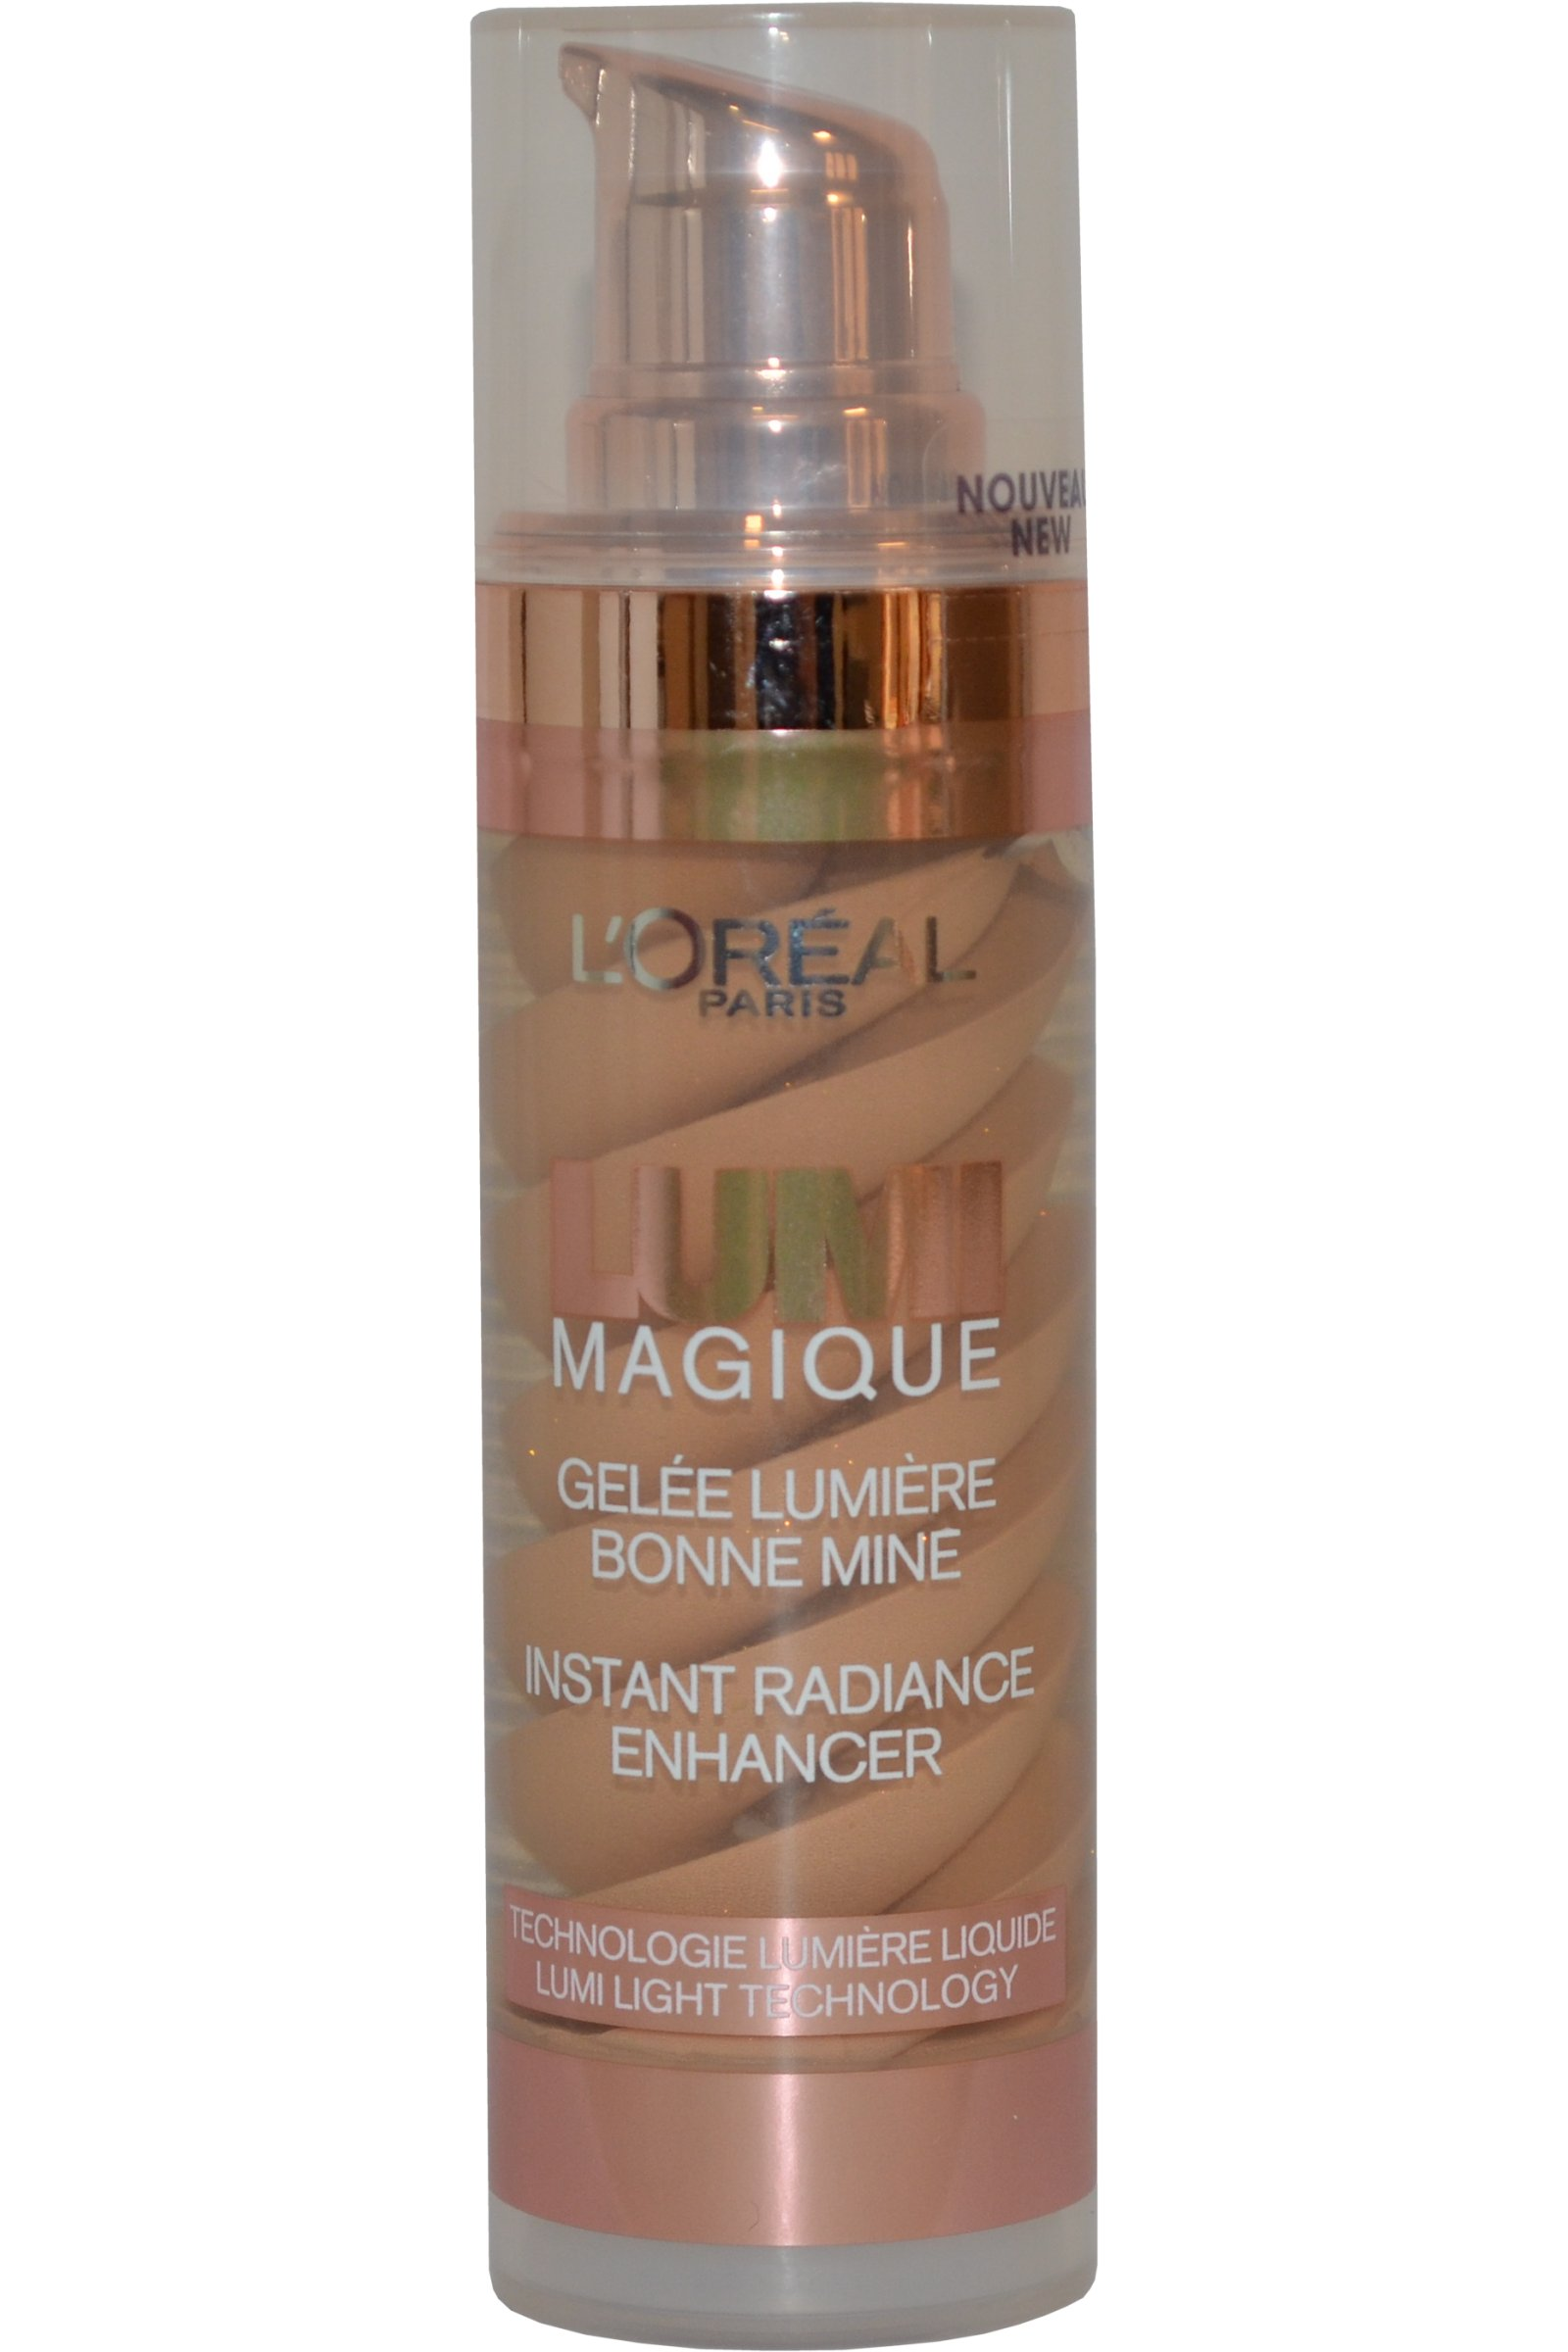 L Oreal Lumi Magique Instant Radiance Enhancer 30ml